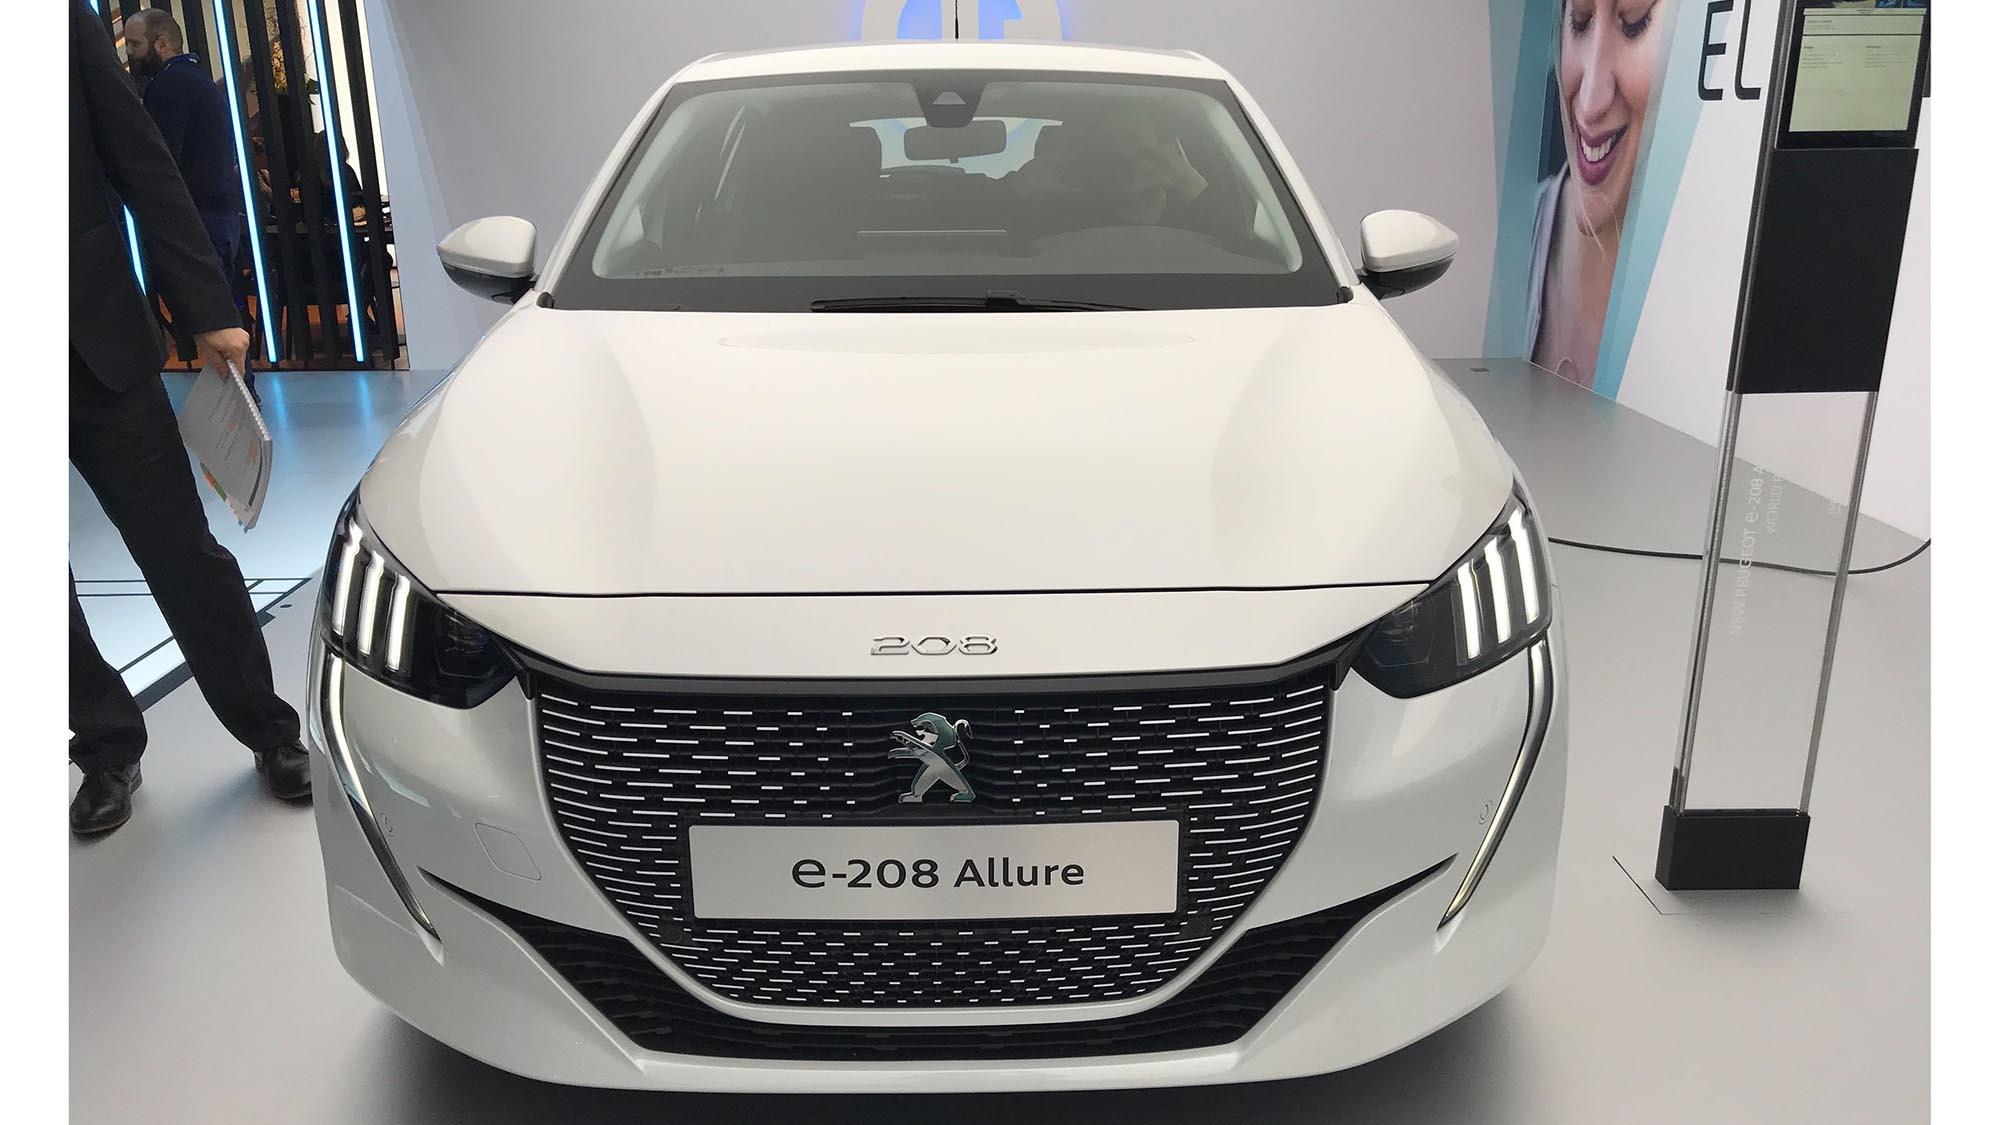 New 2019 Peugeot 208 And E 208 The Full Story Car Magazine